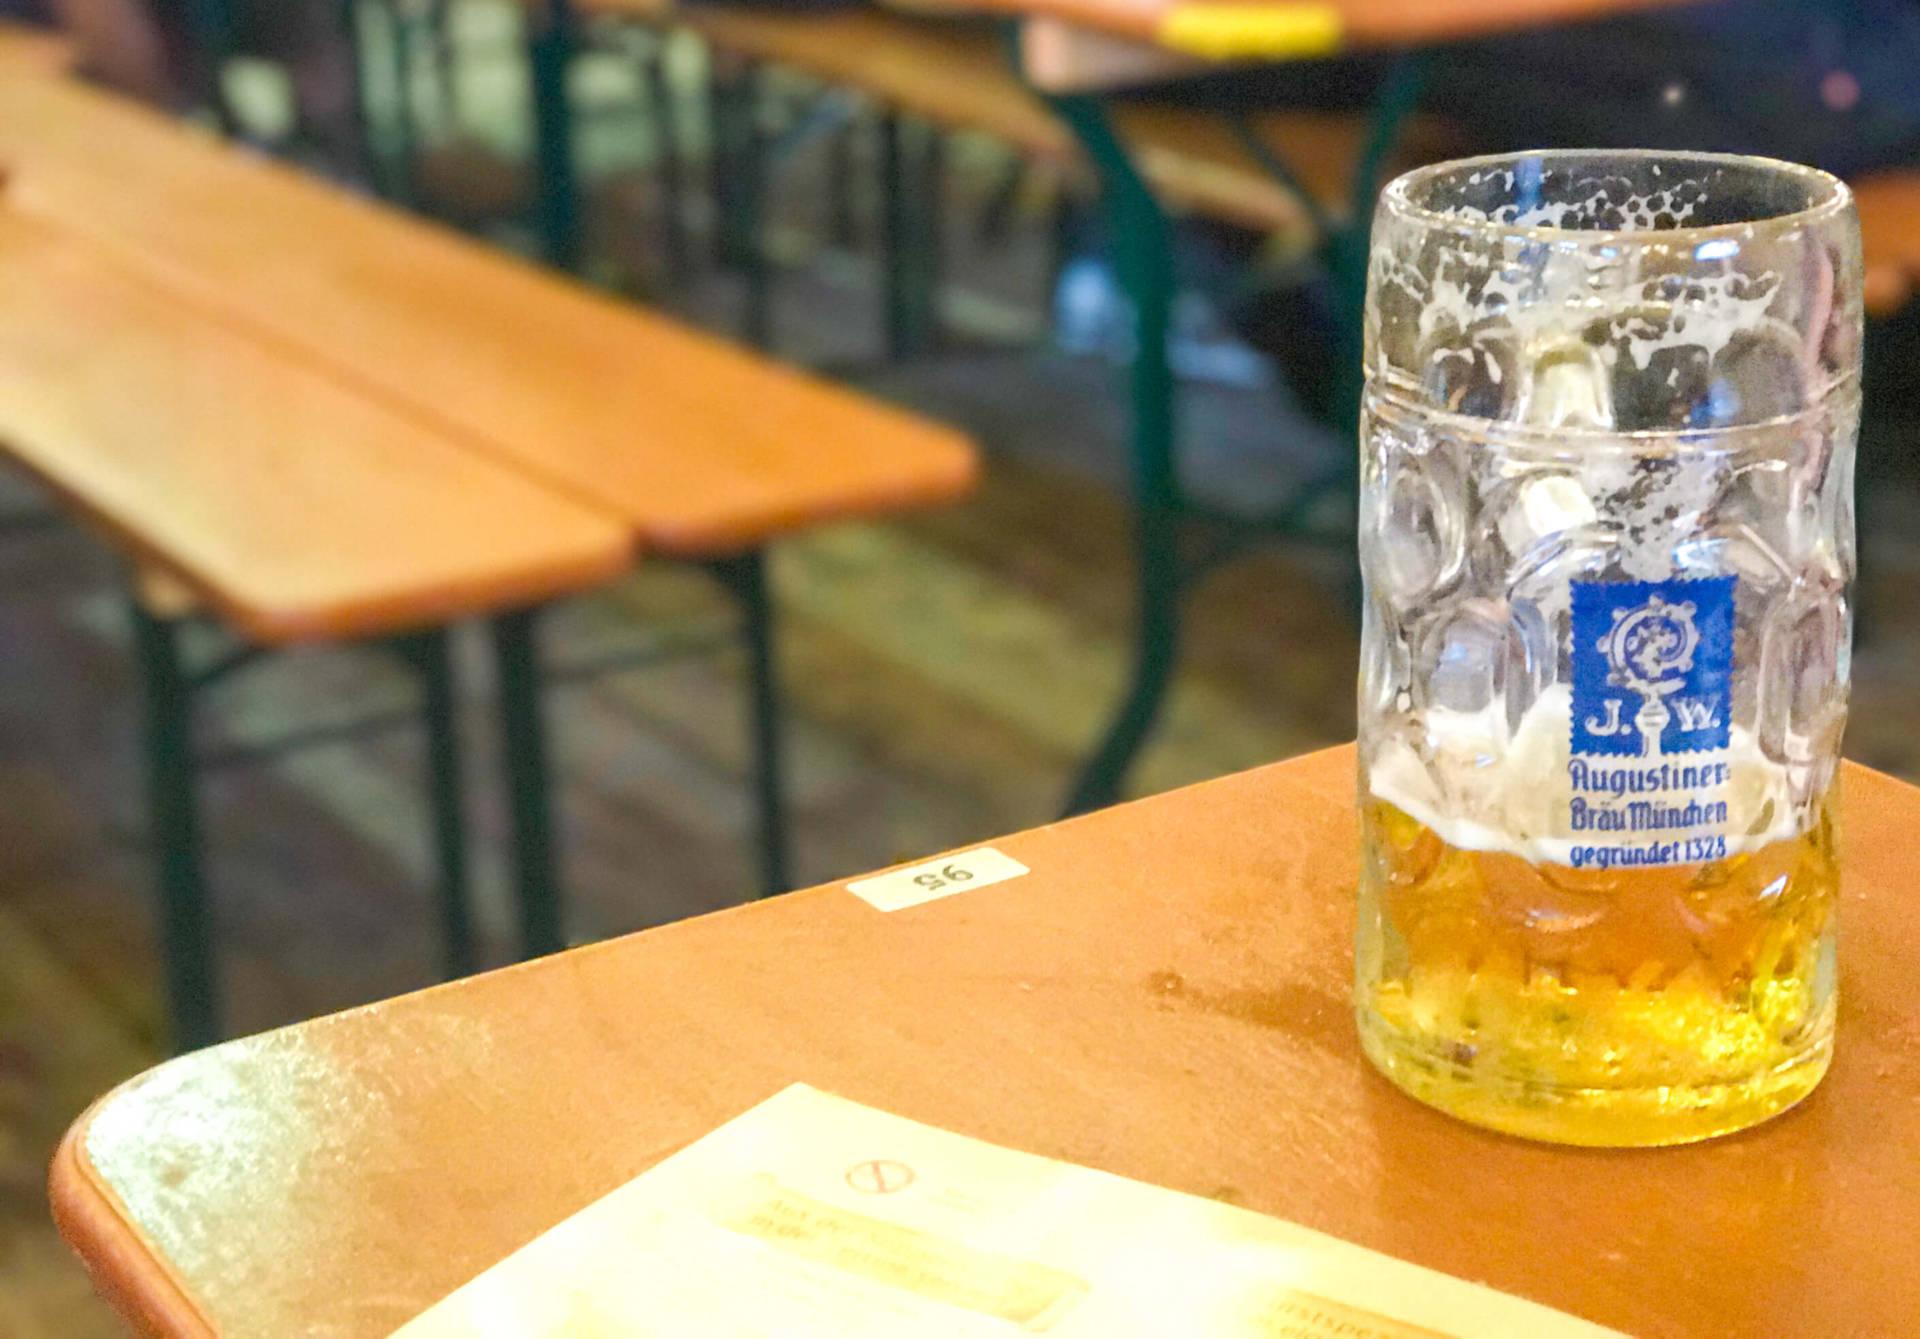 Sober at Oktoberfest Oktoberfest drinks other than beer Not drinking at Oktoberfest